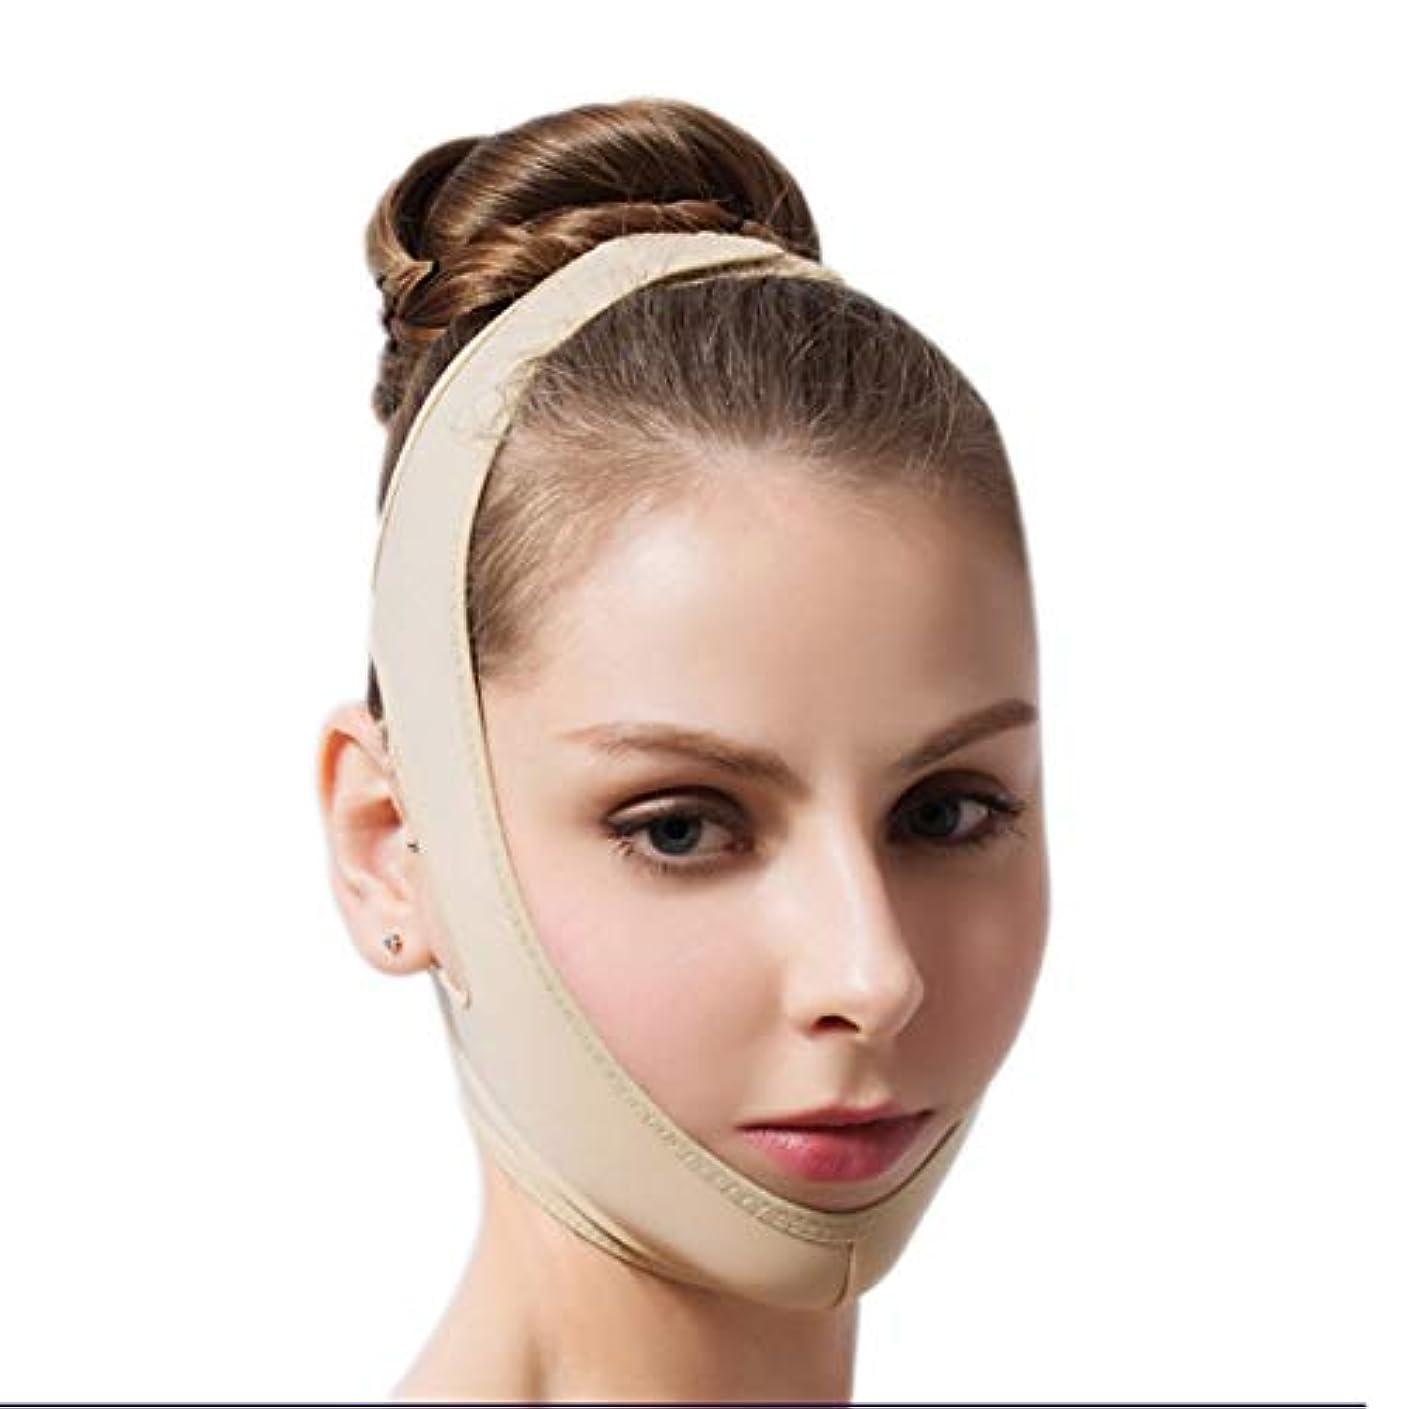 ZWBD フェイスマスク, フェイスリフト包帯V整形術後回復包帯医療グレードマスクバンドルジョー二重あご (Size : L)